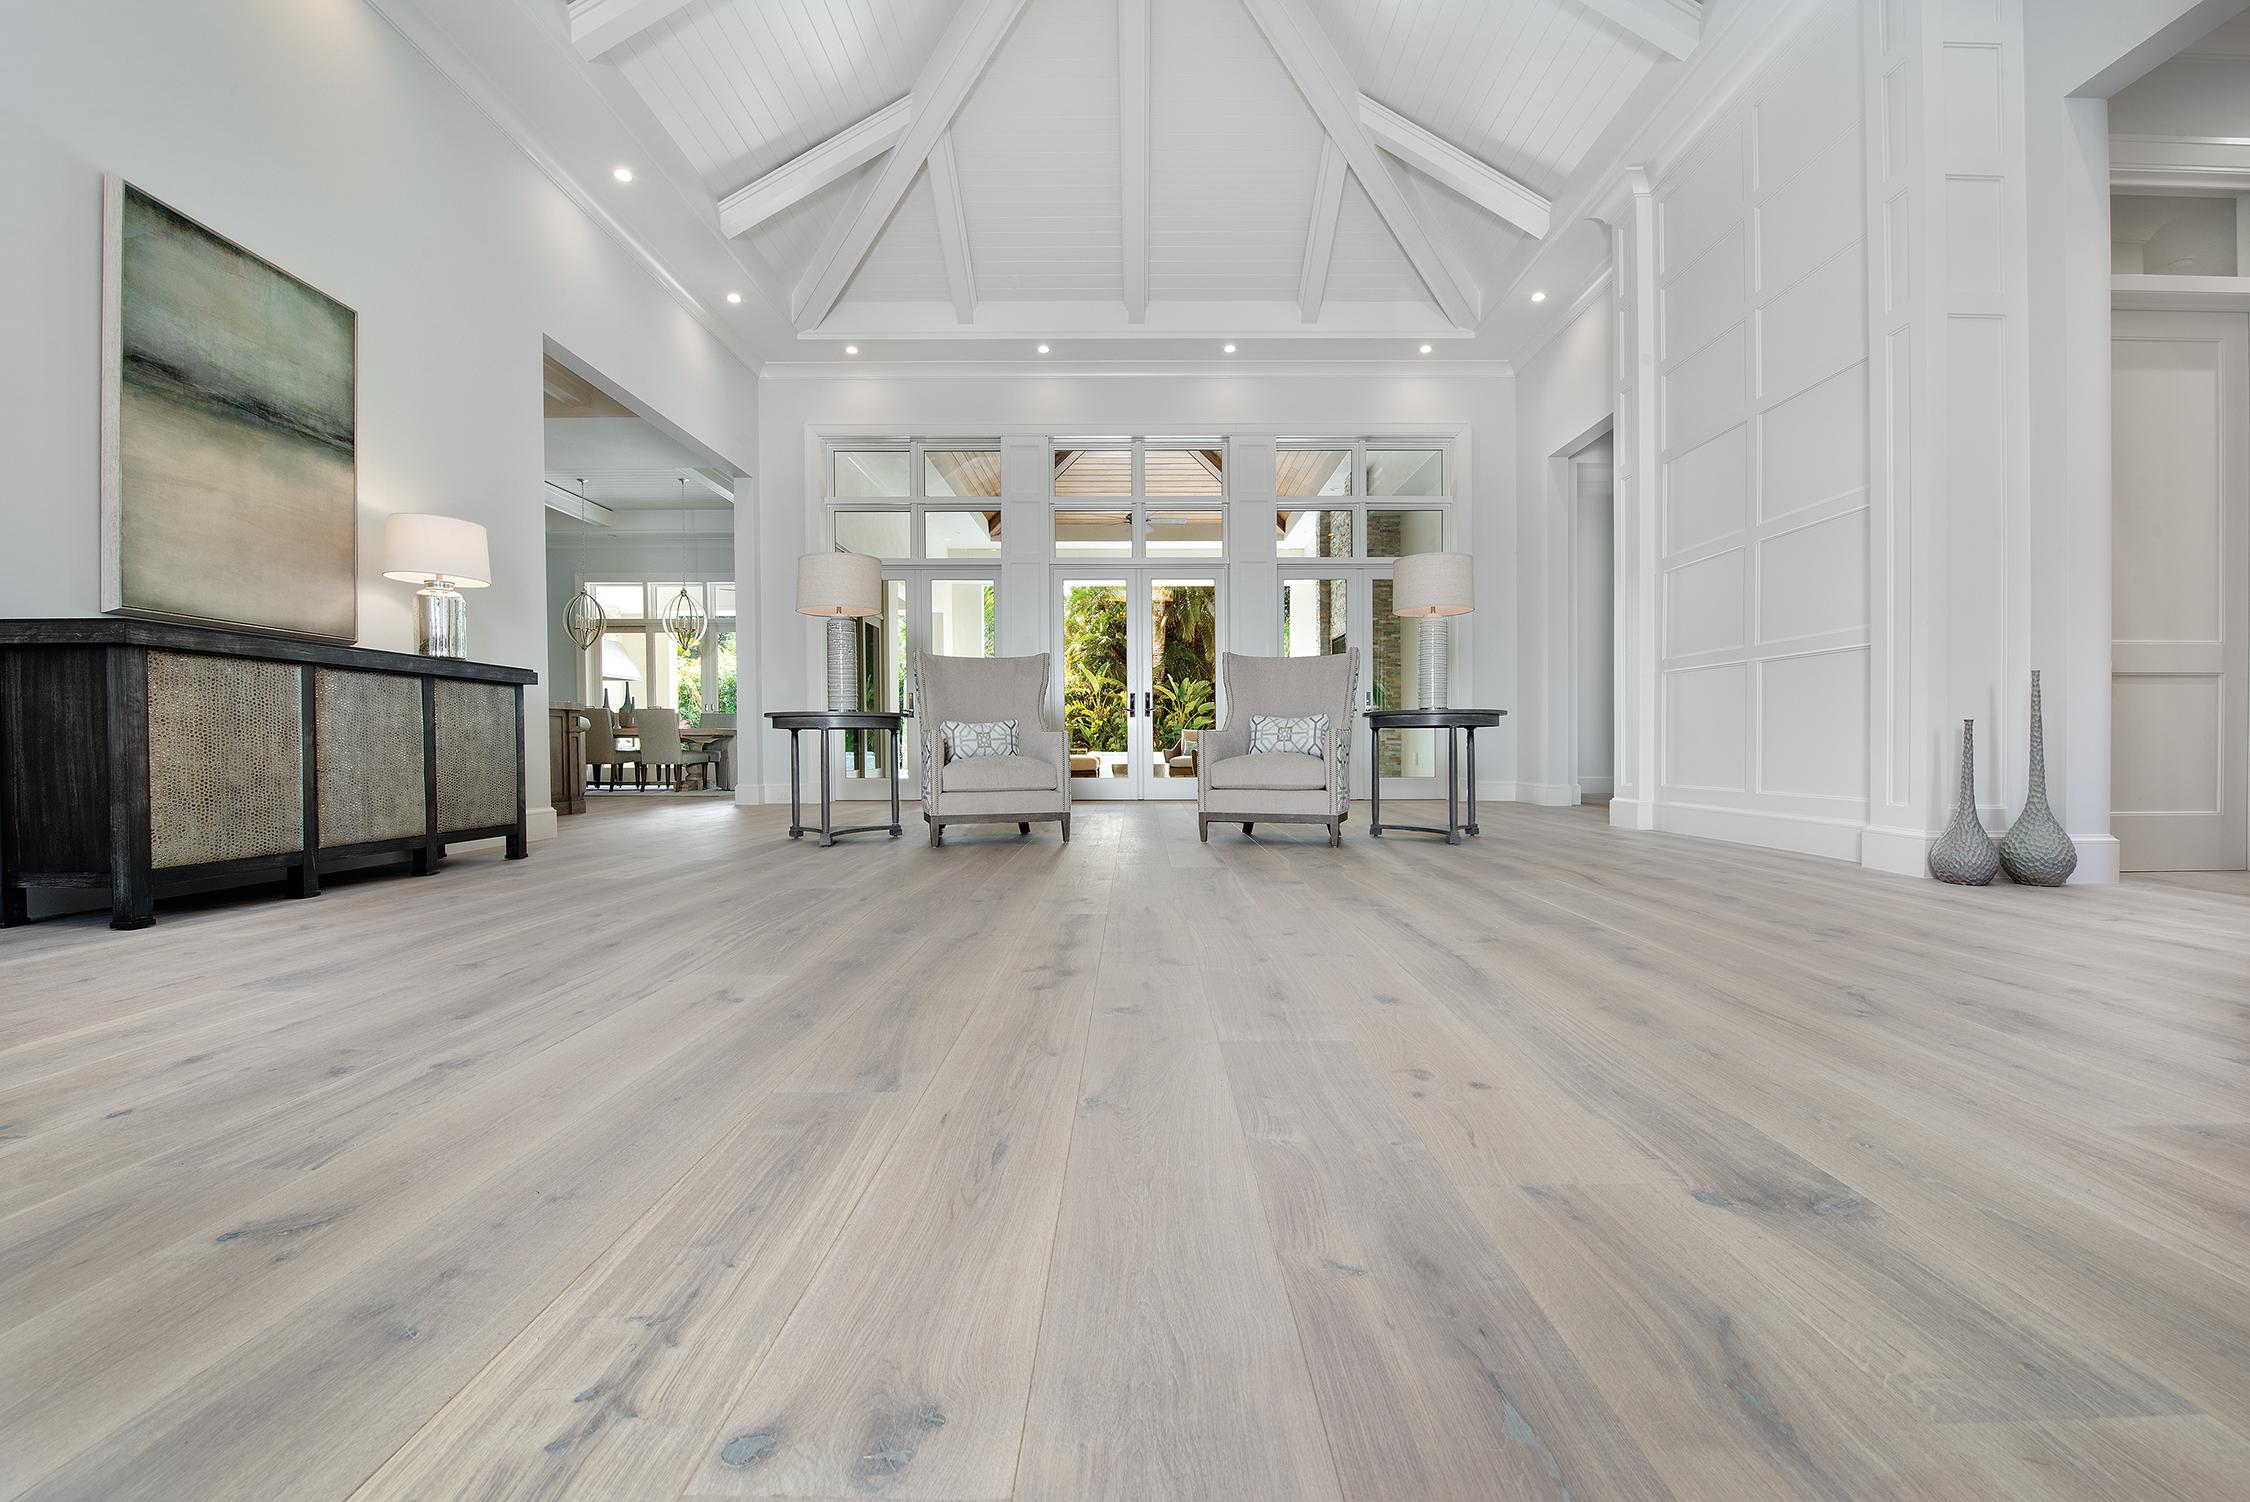 naples-flooring-company-yourhome.jpg